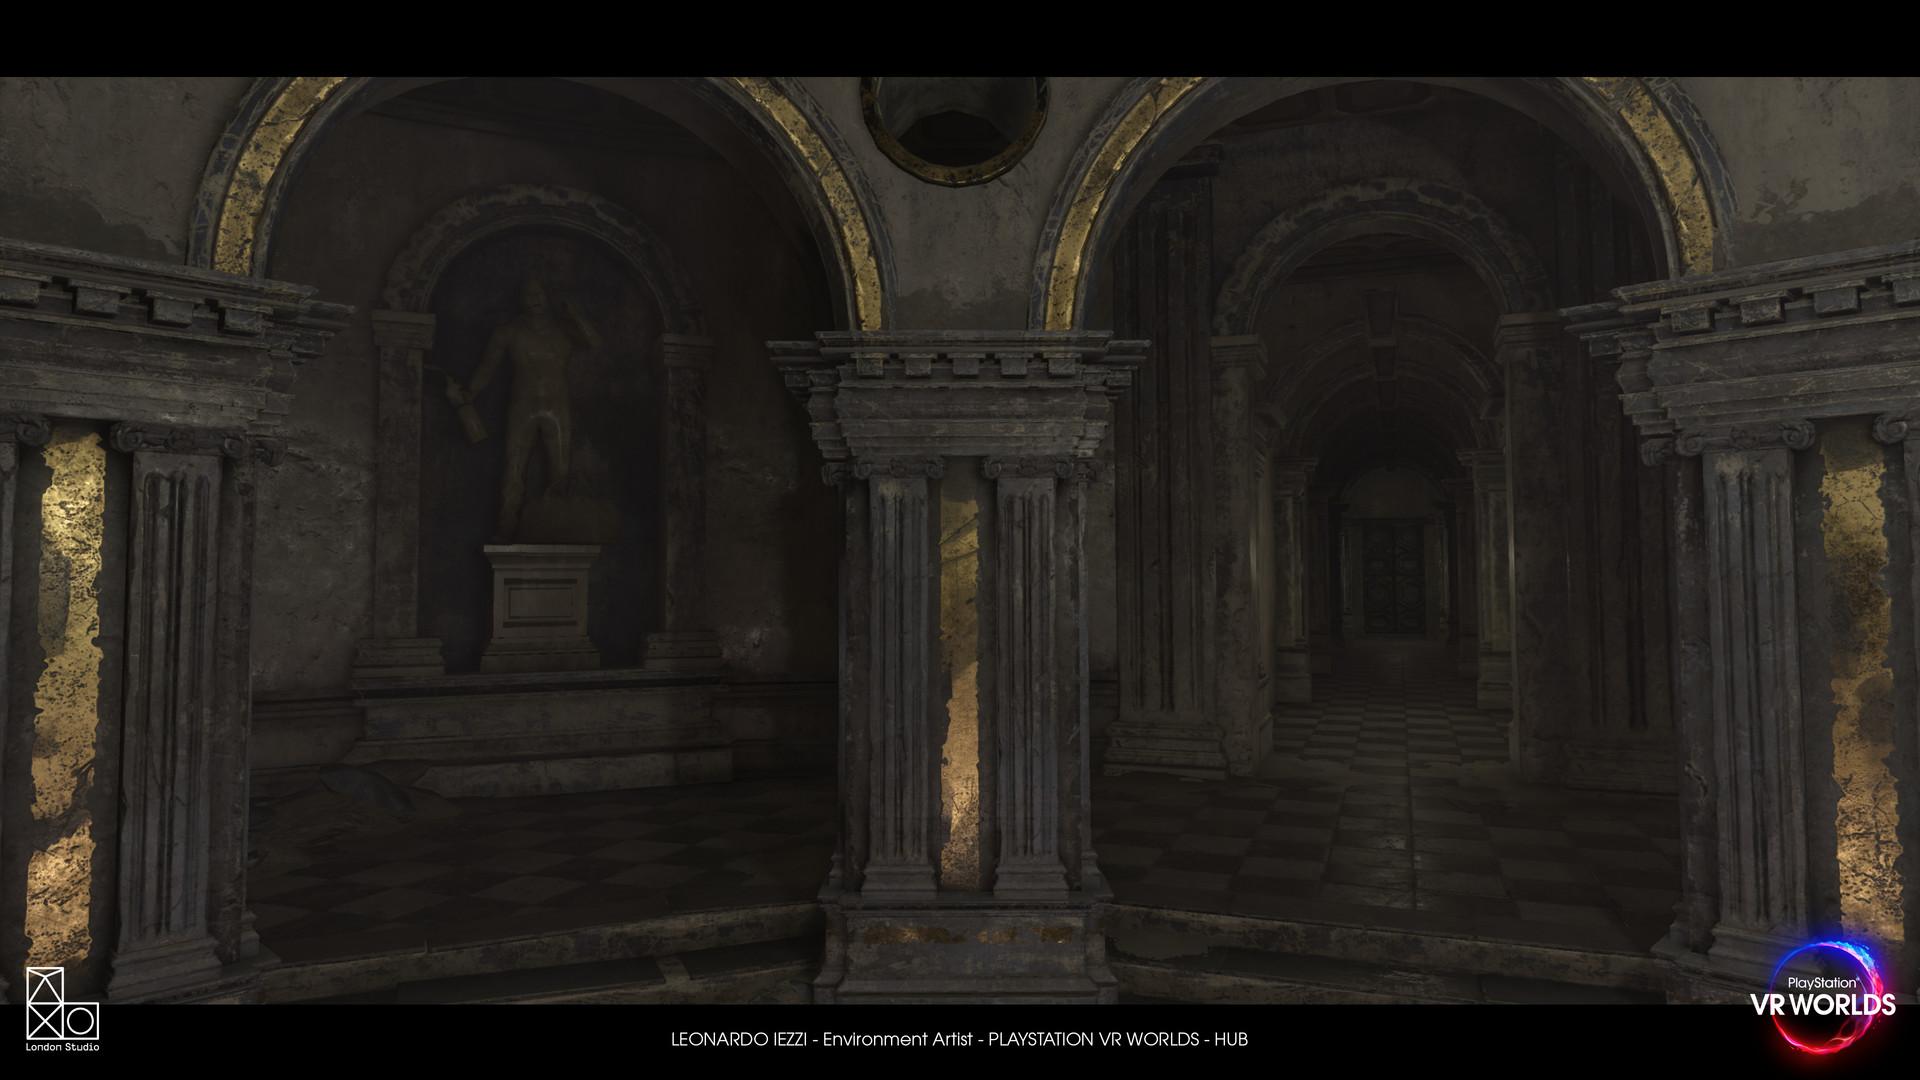 Leonardo iezzi leonardo iezzi environment artist vr worlds hub 04